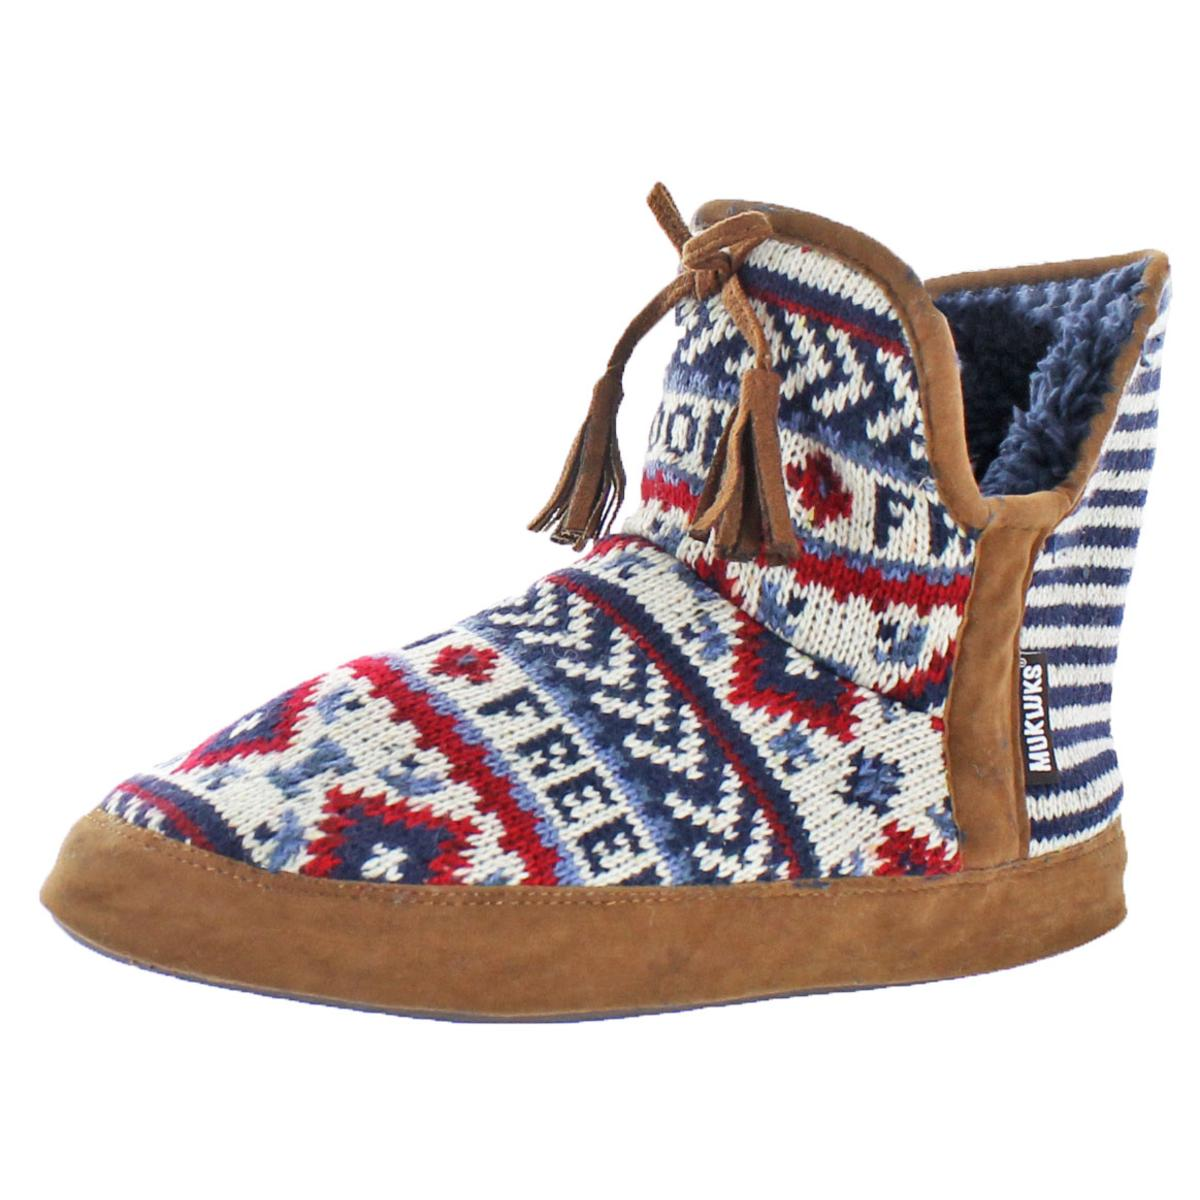 19cdf2ae063c4 Mukluk Pennley Women's Knit Short Sweater Boots Slippers | eBay